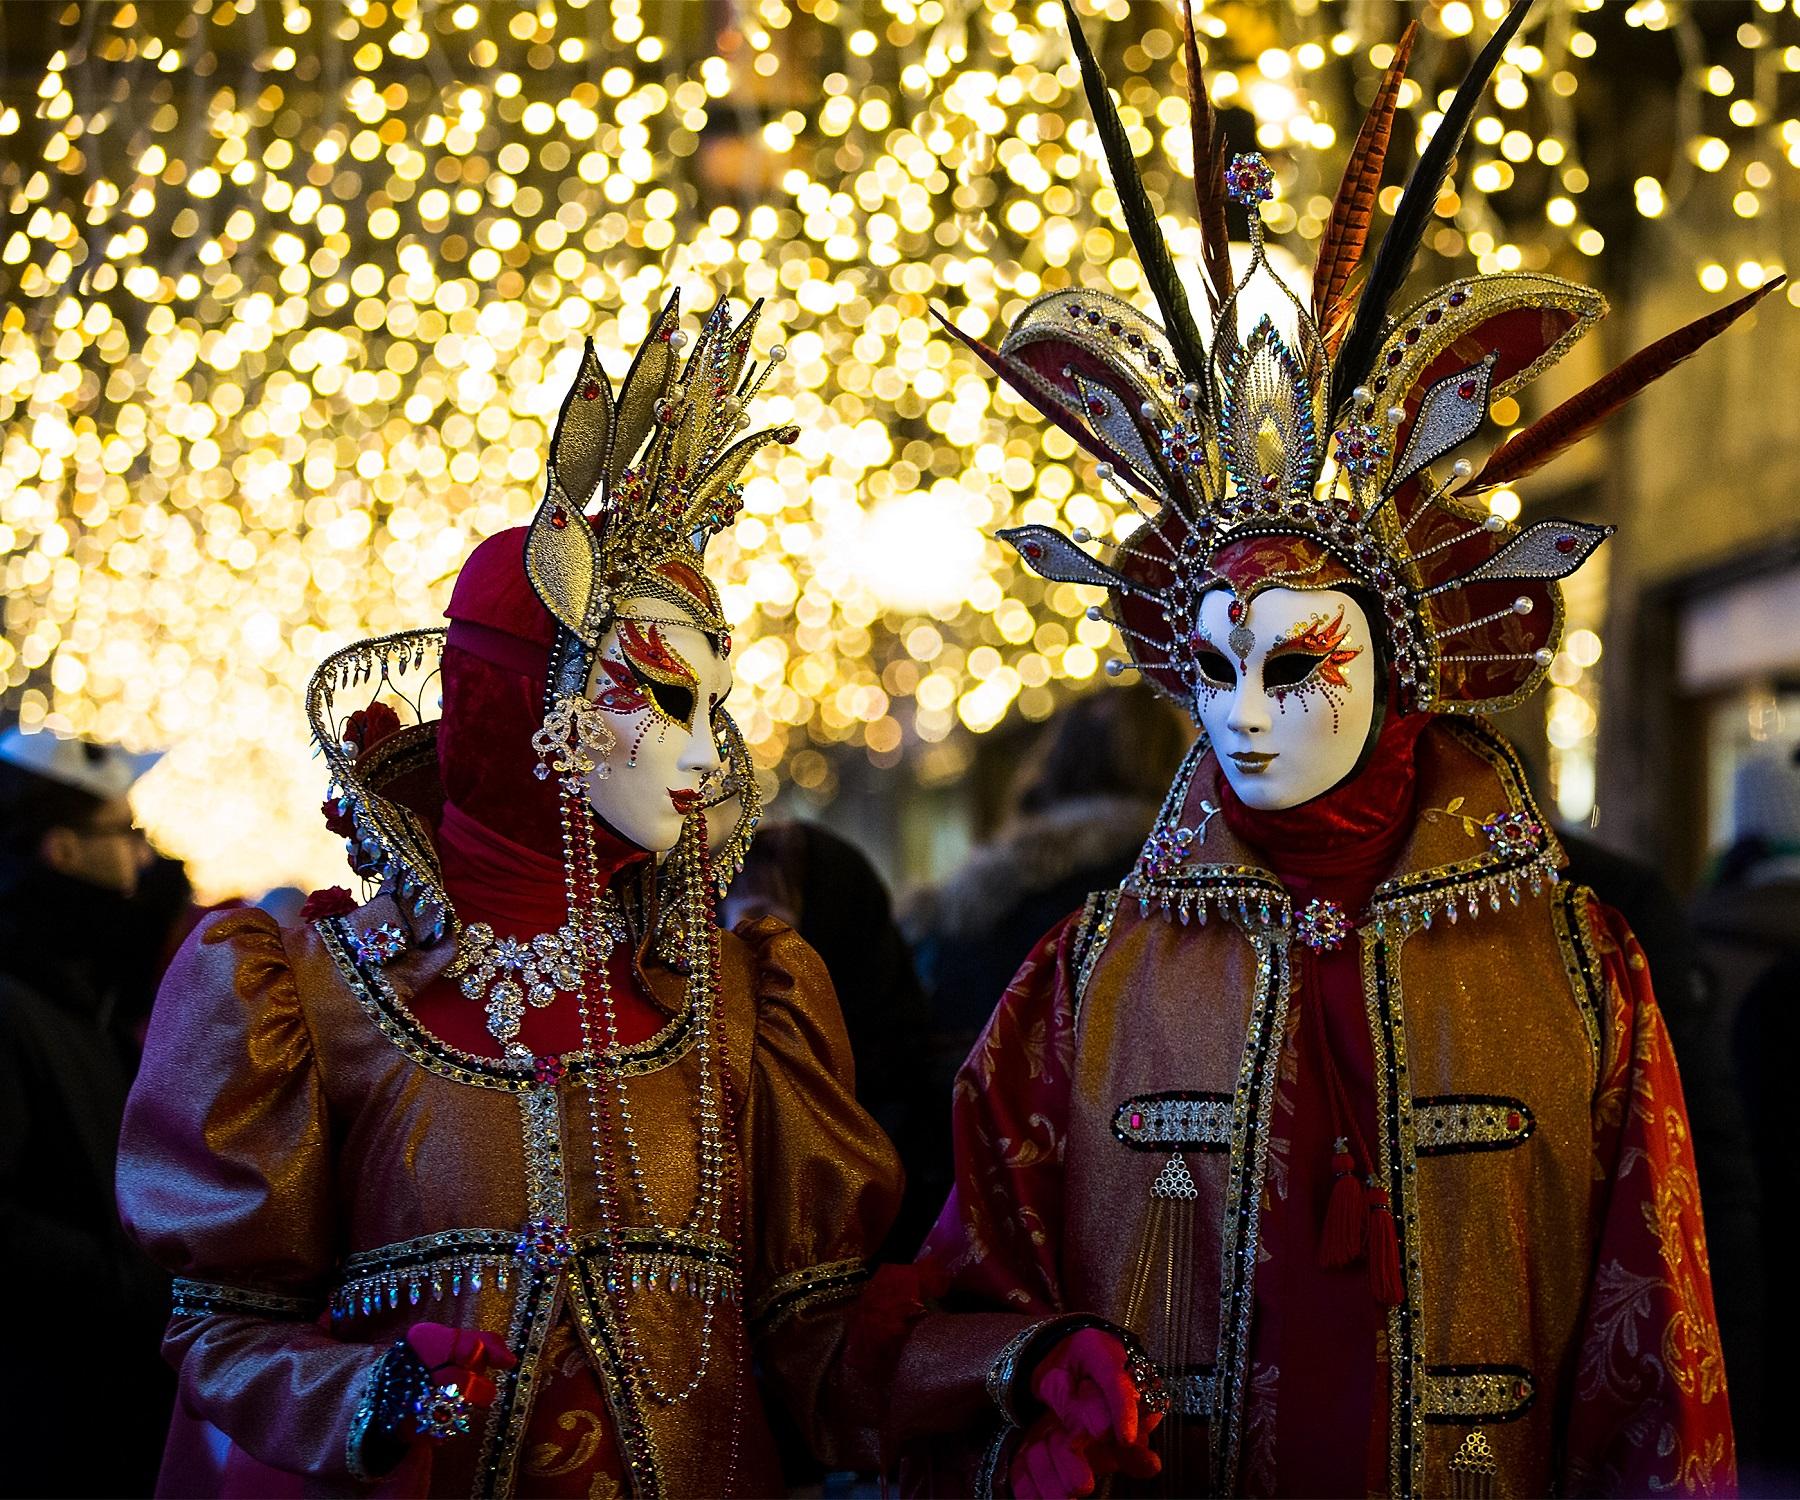 web_photo_venice_carnival8_040218.jpg